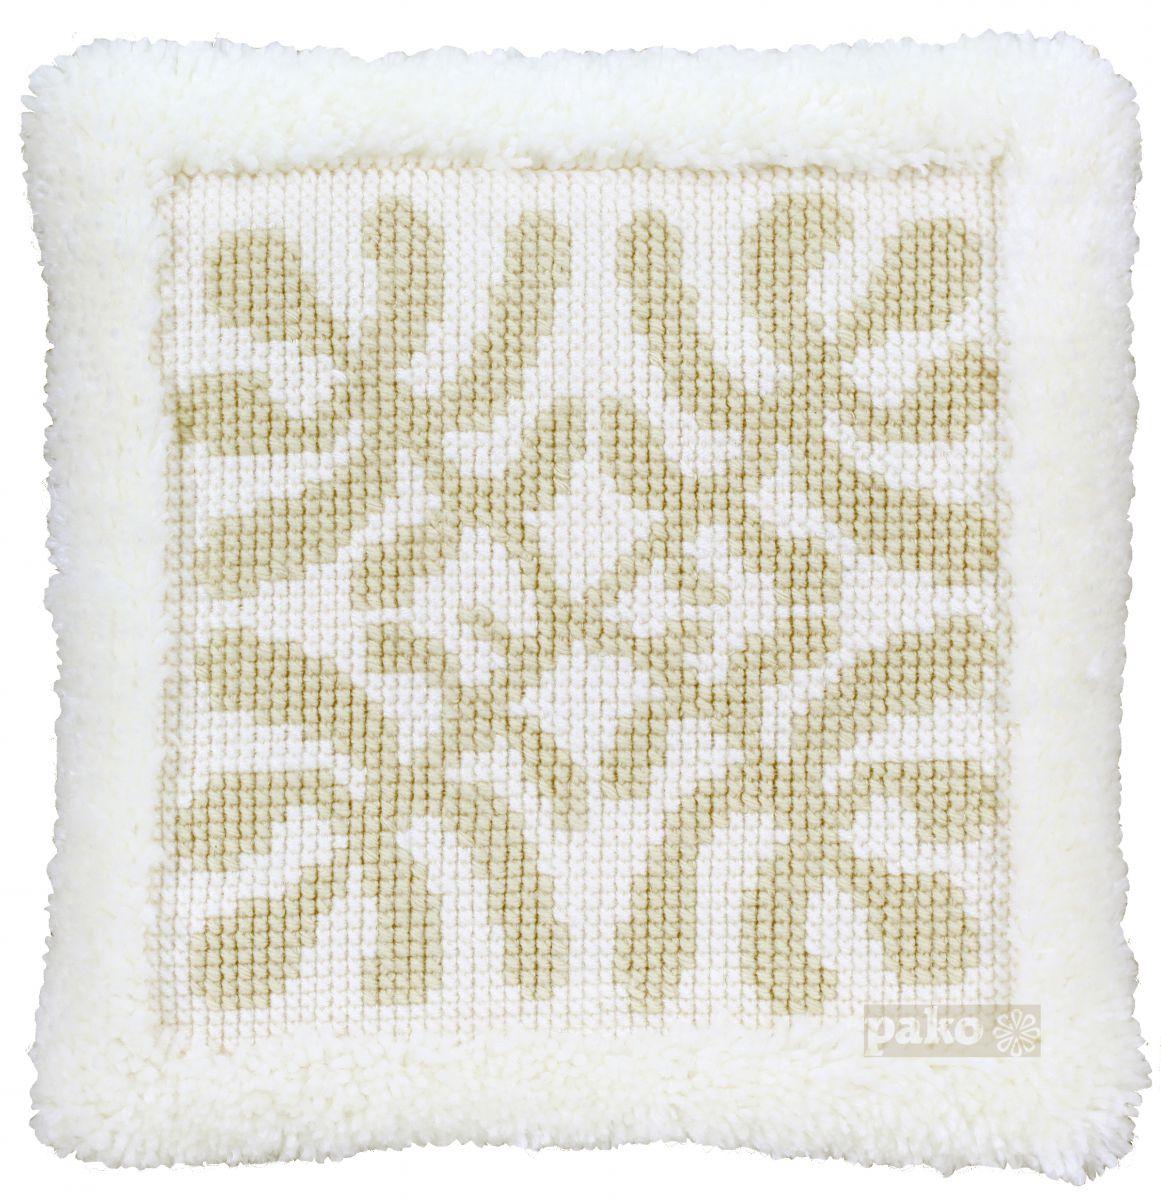 cross stitch latch cushion modern nature printed